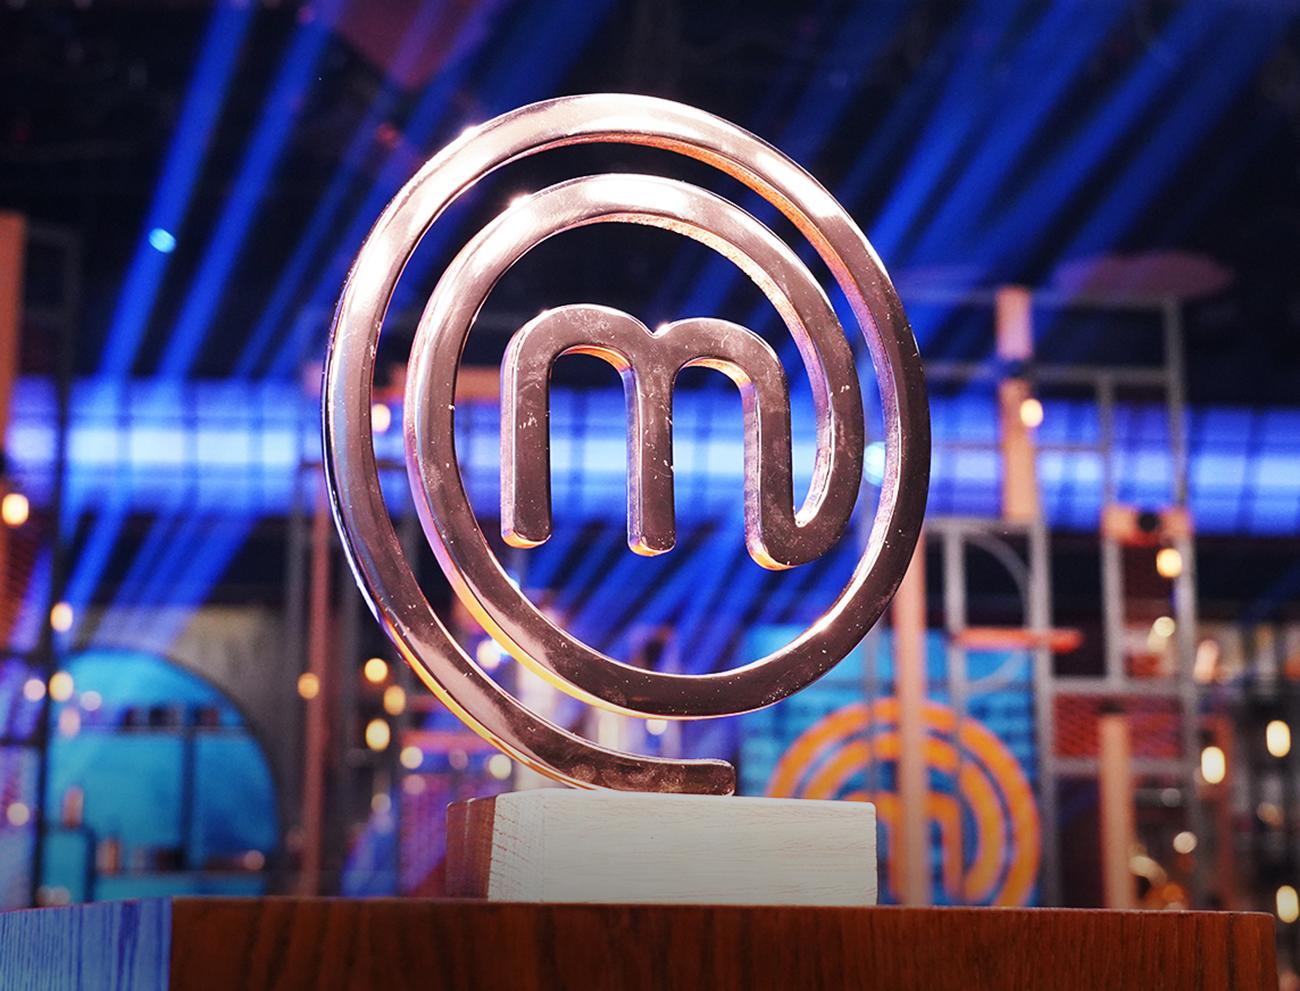 Masterchef 5 τελικός: Μαργαρίτα και Διονύσης στην τελευταία μονομαχία